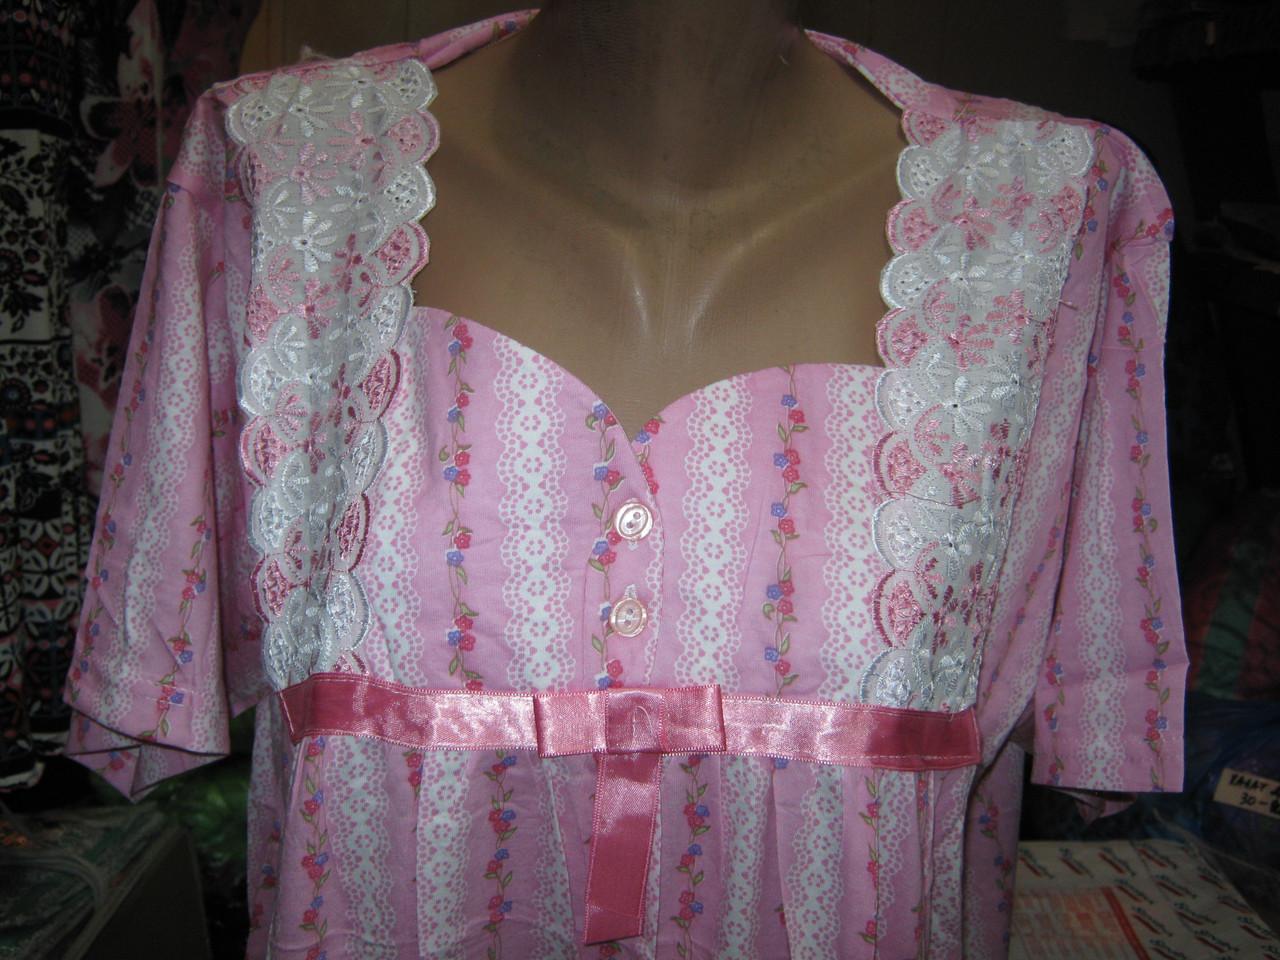 743fa6be4f2ec9a Ночная рубашка большого размера рукав SENTINA: продажа, цена в ...